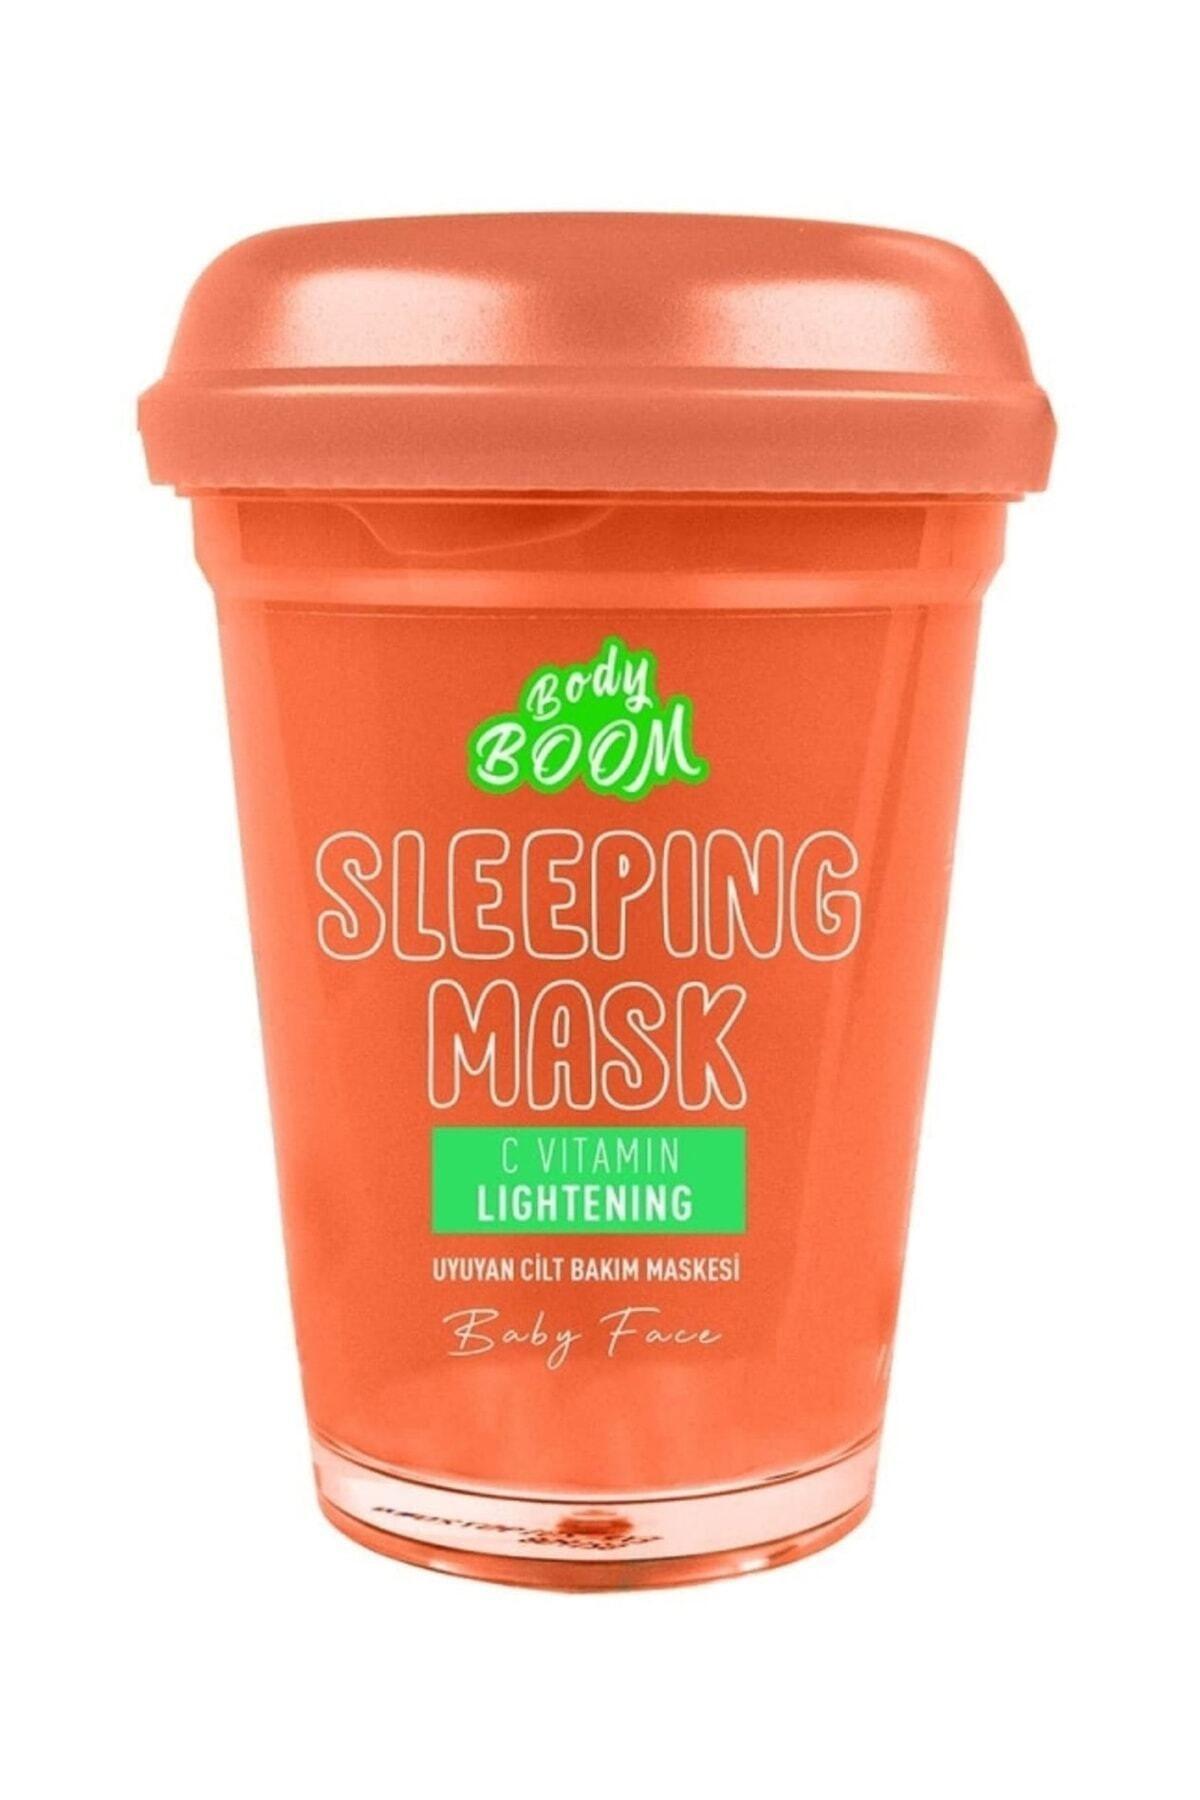 Body Boom C Vitamini Uyuyan Maske 100 ml 8697863686926 1